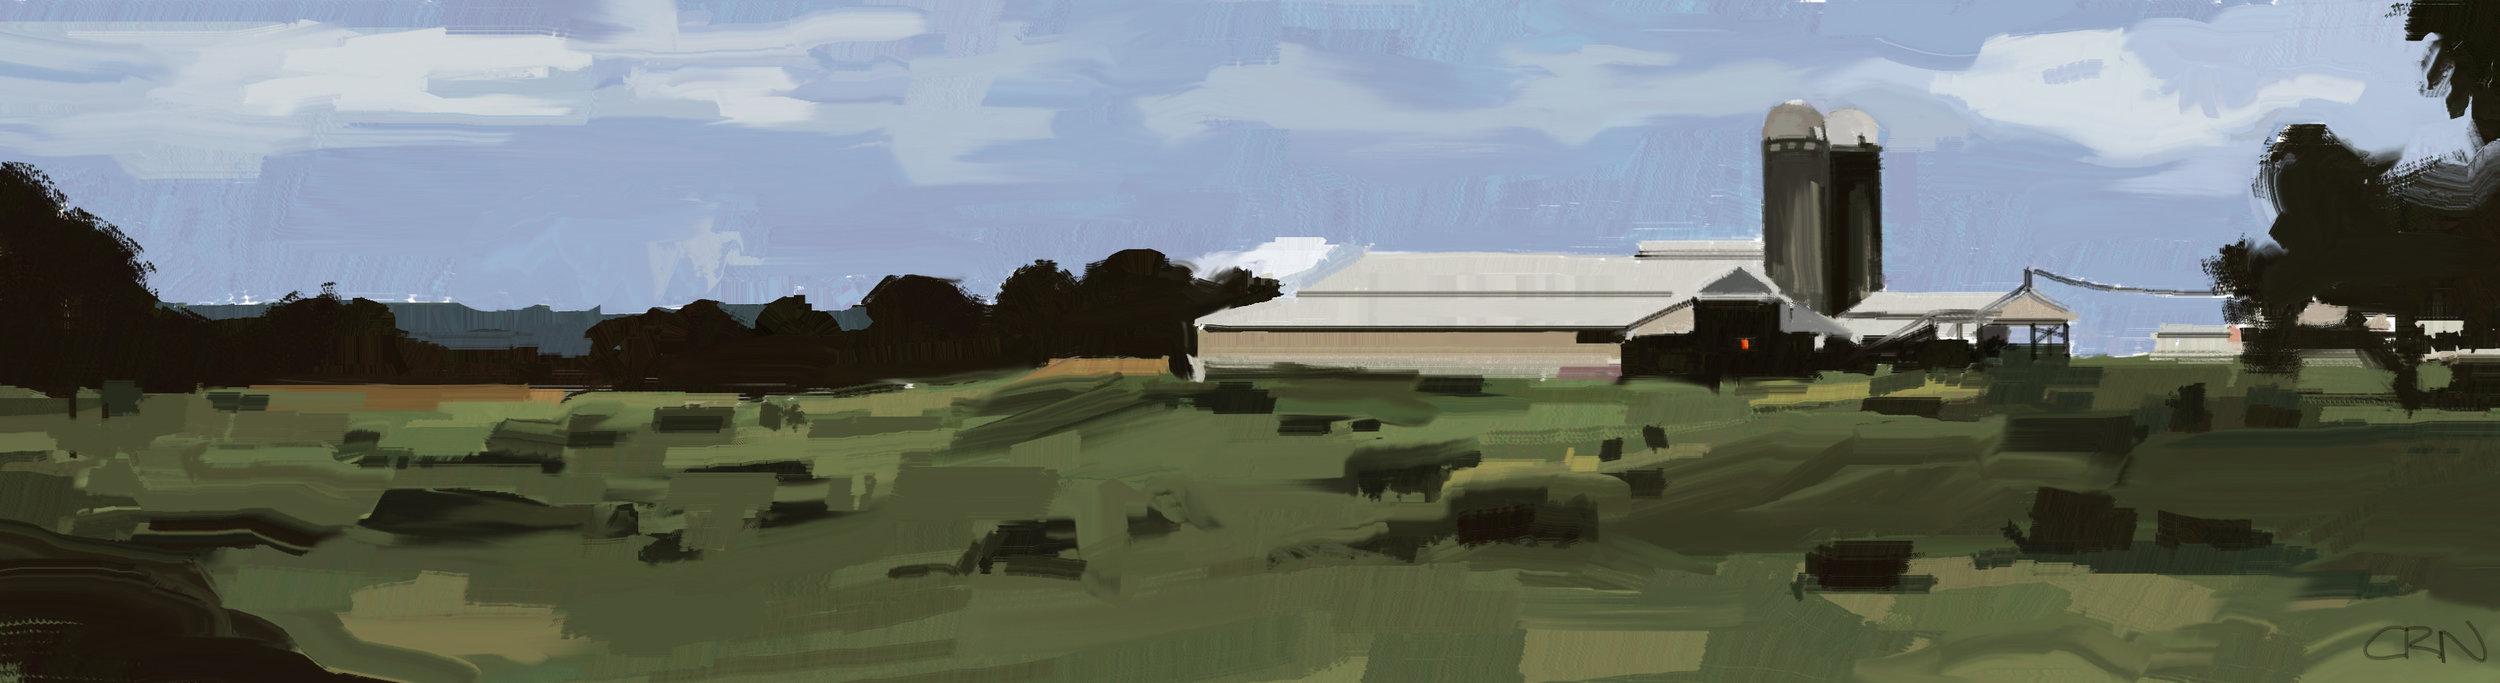 Newton_Wide Farm_Digital_3592x1080.jpg